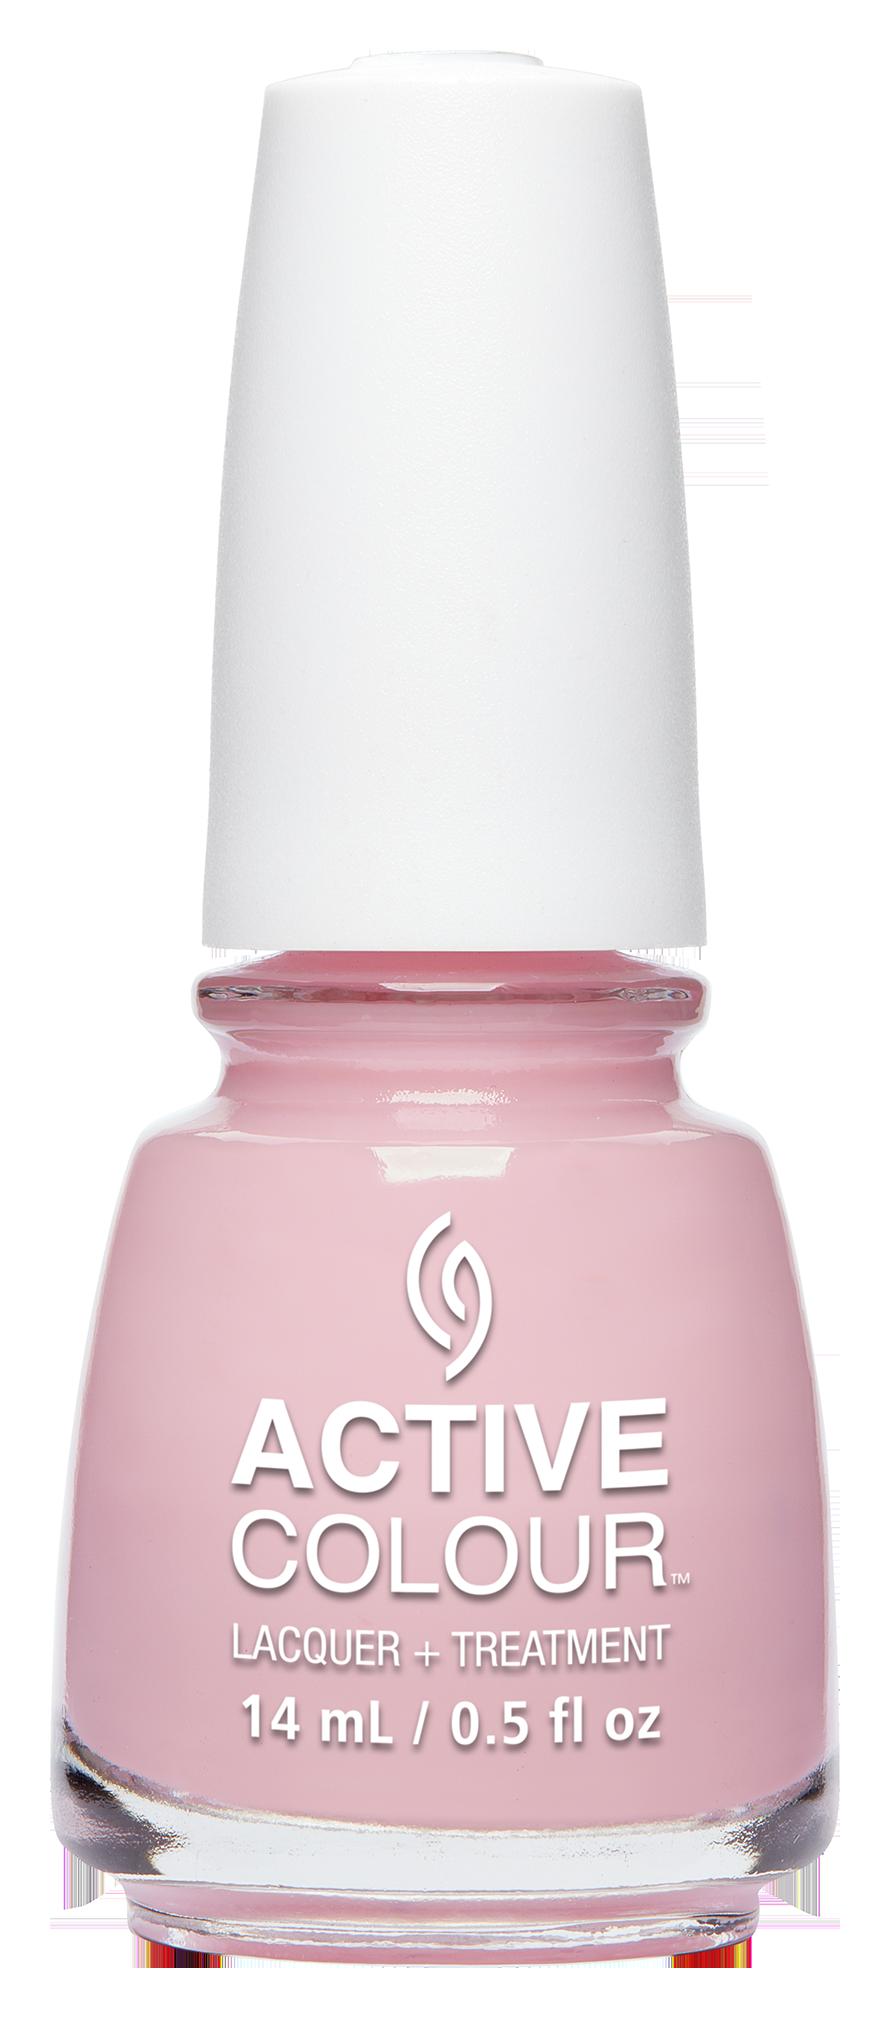 Active Colour - Preserve In Pink | China Glaze - Active Colour ...